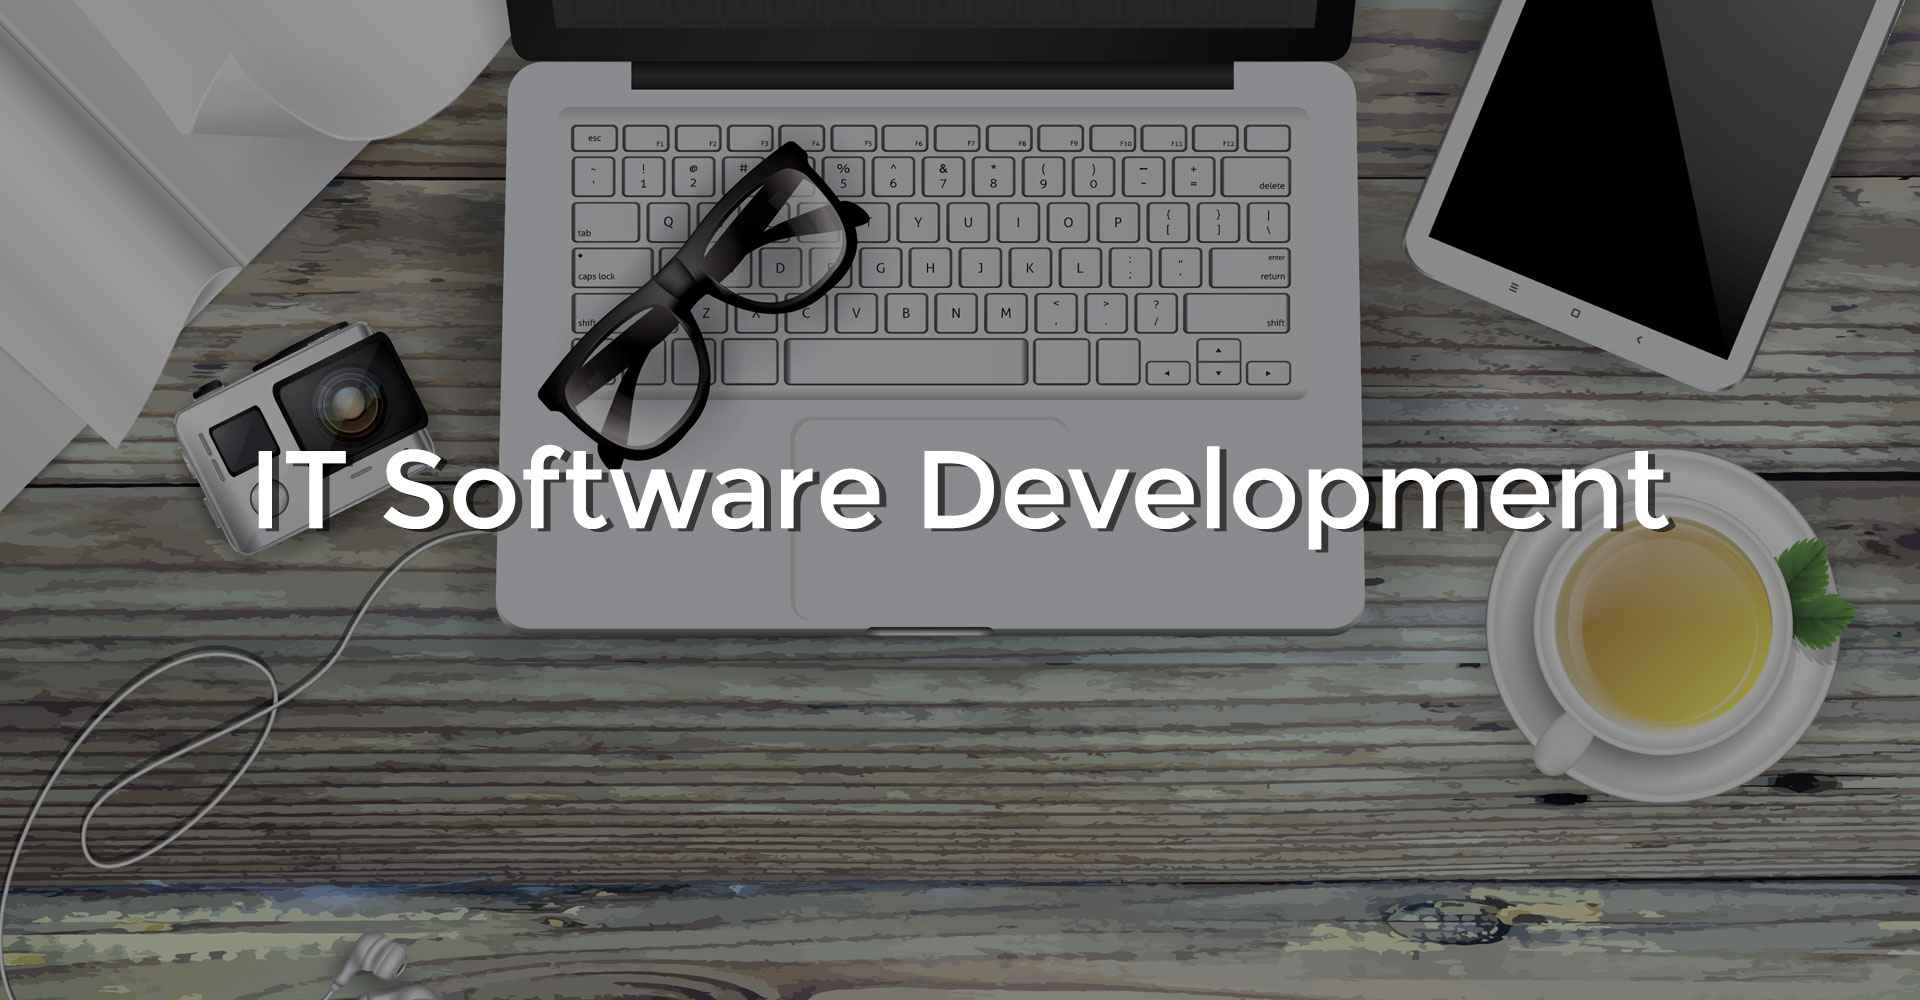 IT Software Development